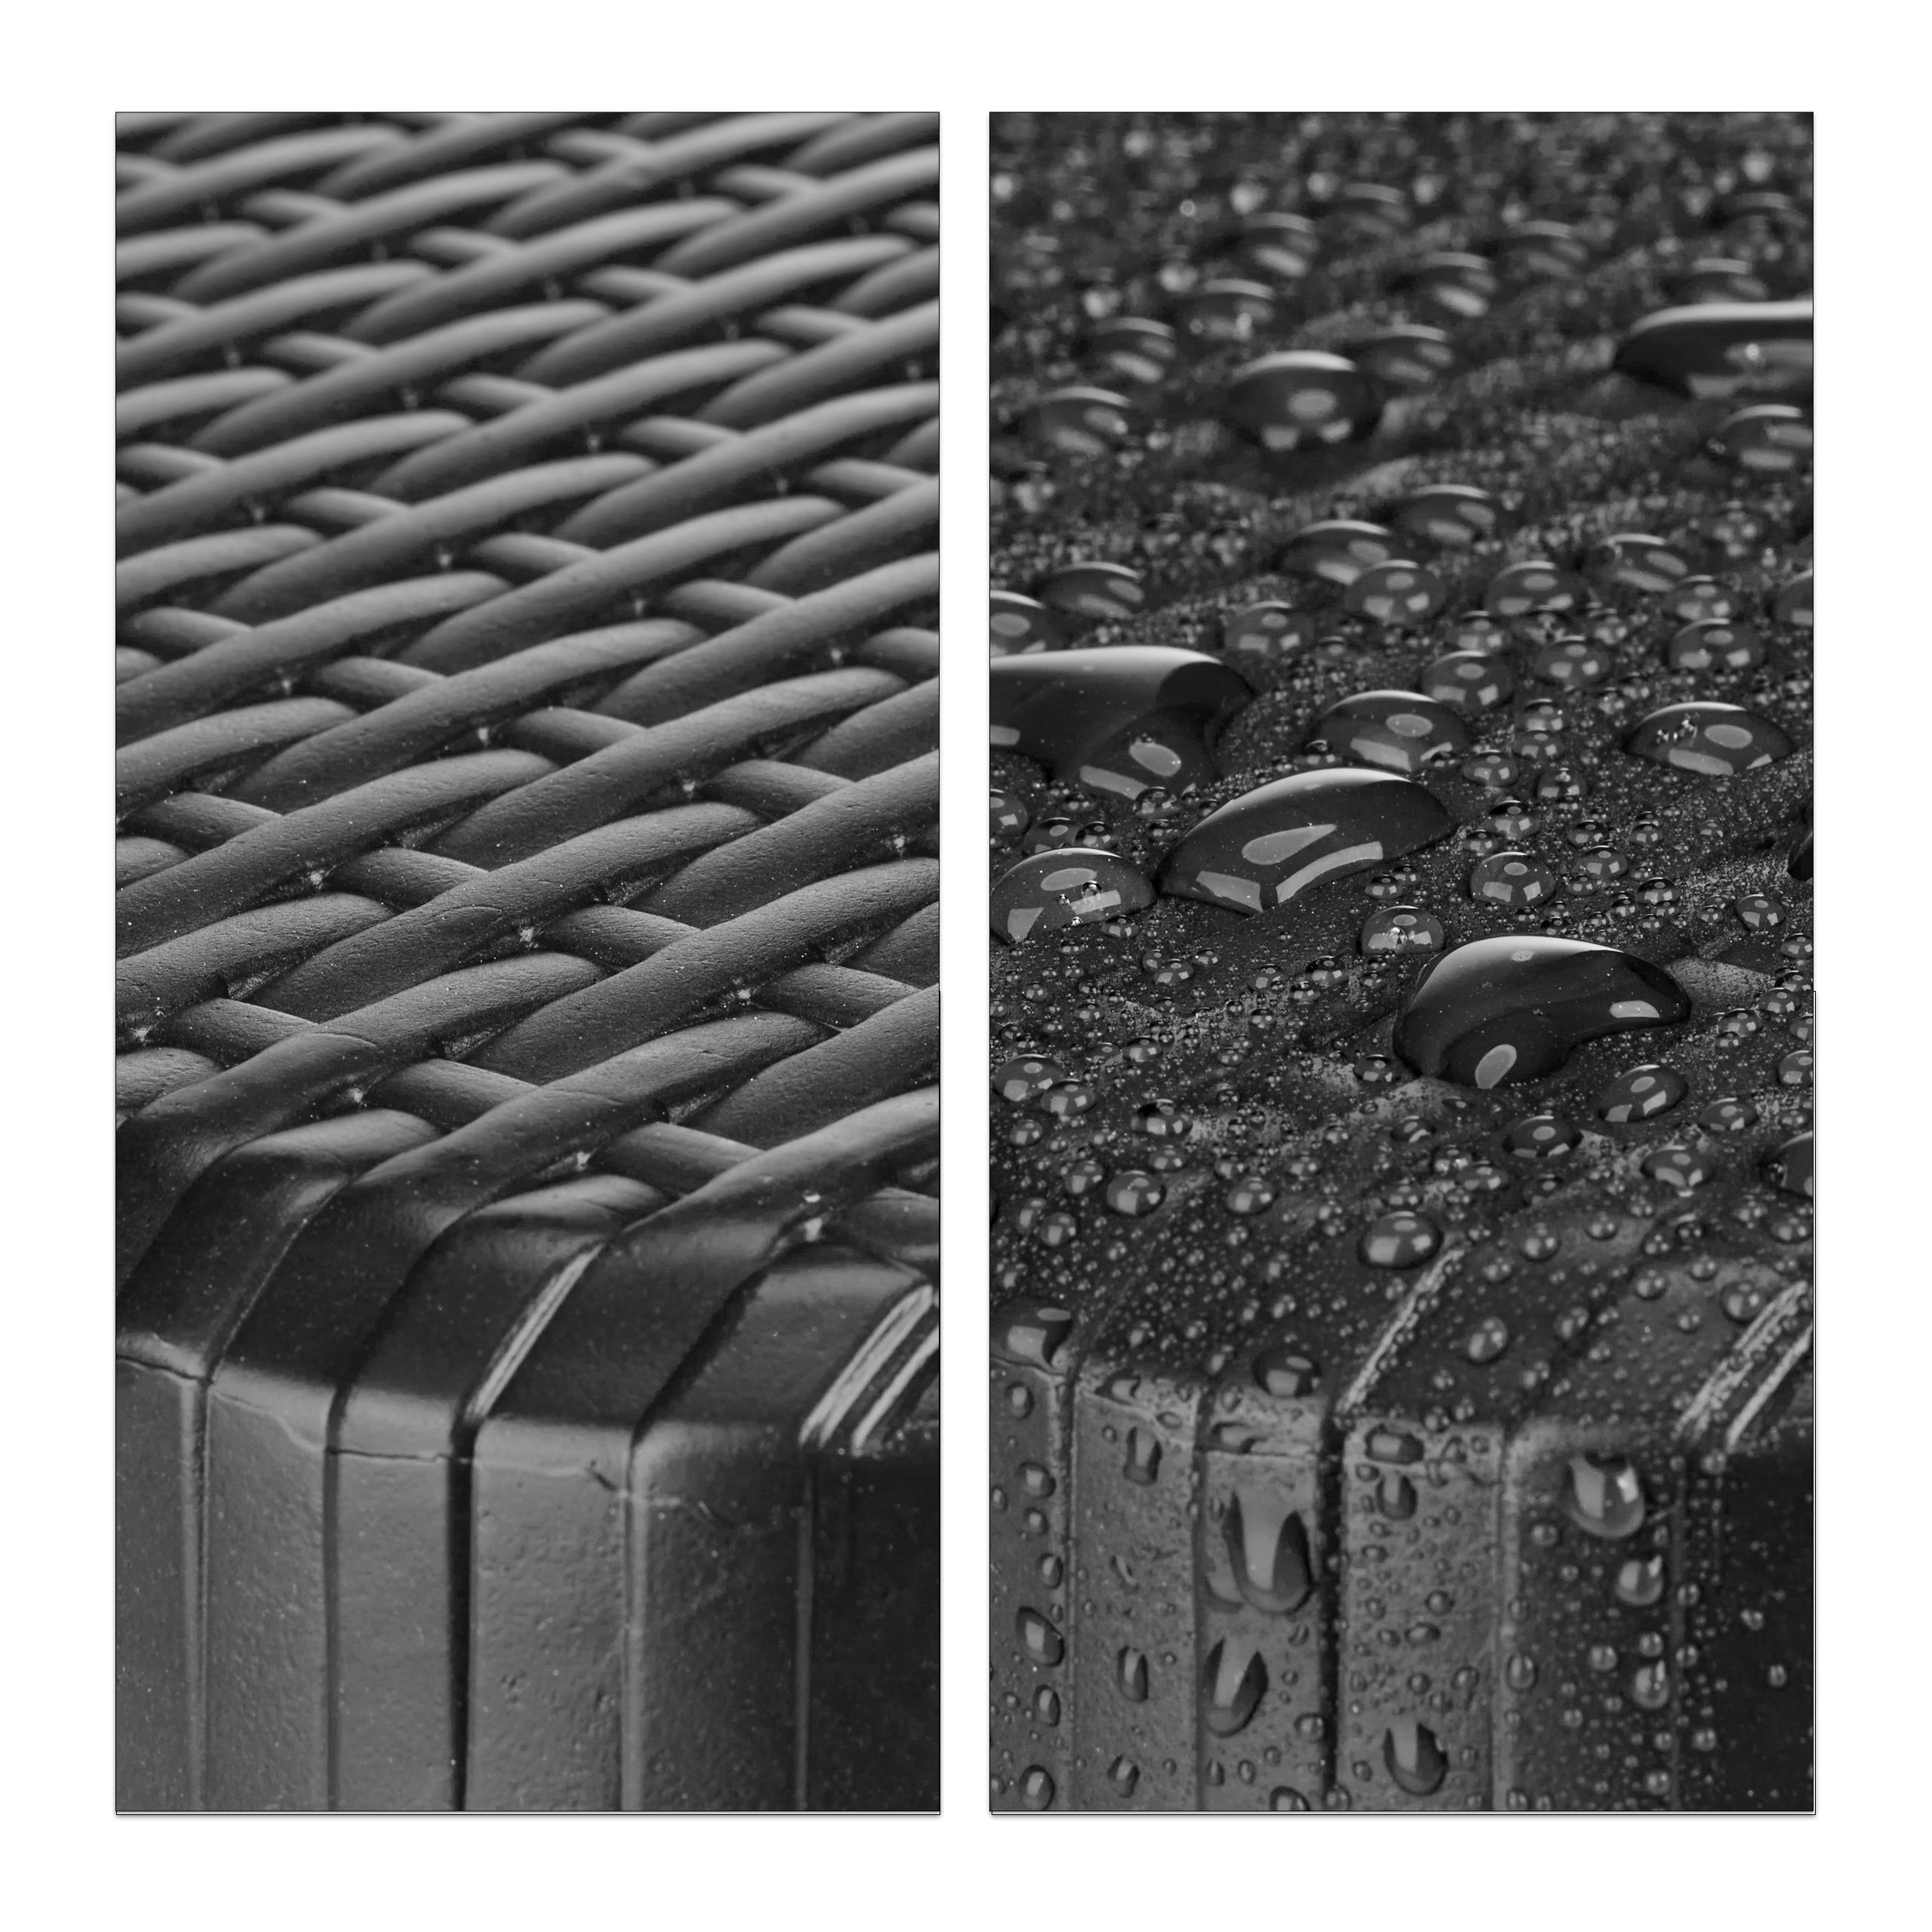 Bierzeltgarnitur-klappbar-BASTIAN-in-Rattan-Optik-Gartenmoebel-Set-Biertisch Indexbild 14